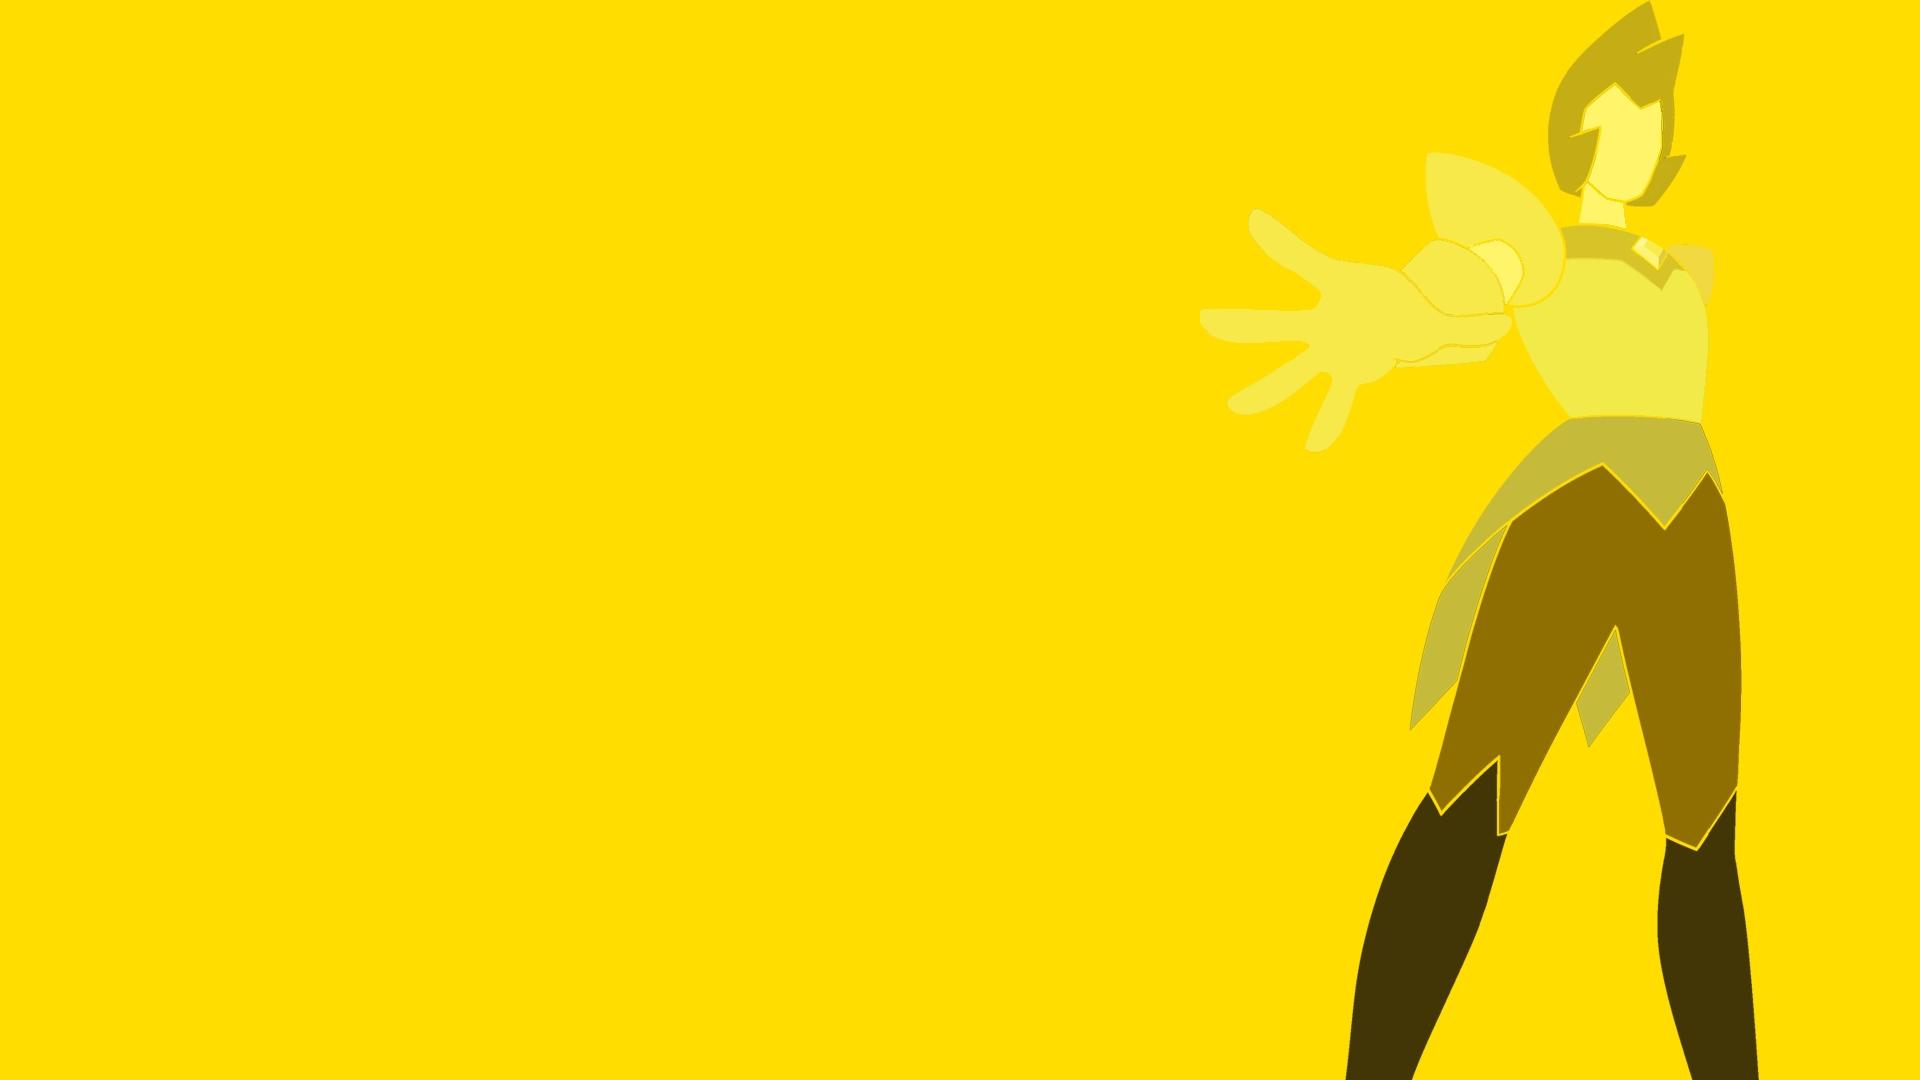 Steven Universe Vector Wallpaper For Pc